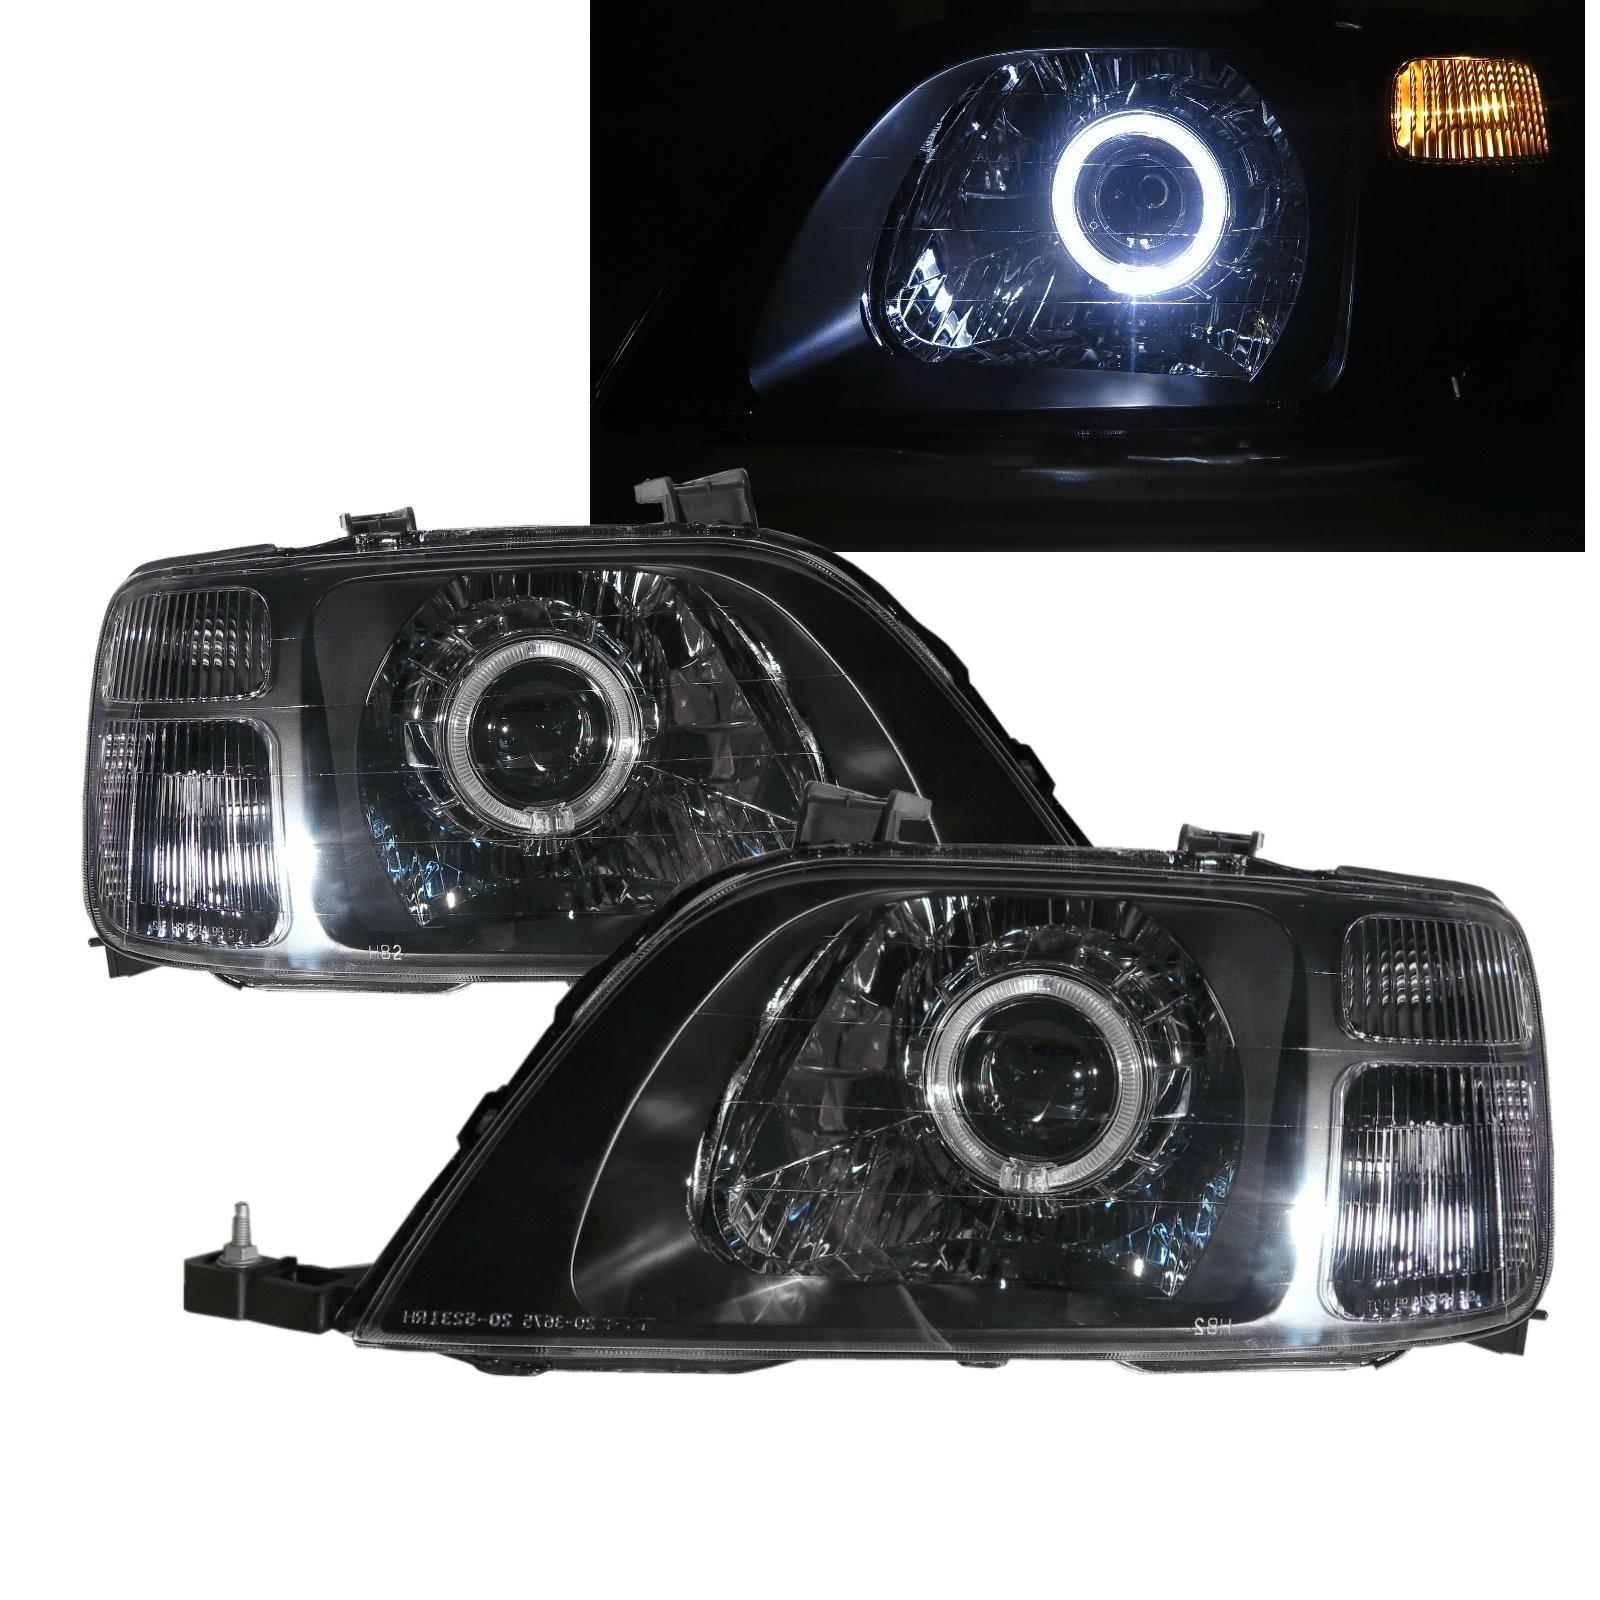 CrazyTheGod CR-V CRV RD1-RD3 First generation 1996-2001 SUV 5D Guide LED Angel-Eye Projector Headlight Headlamp Black for HONDA LHD